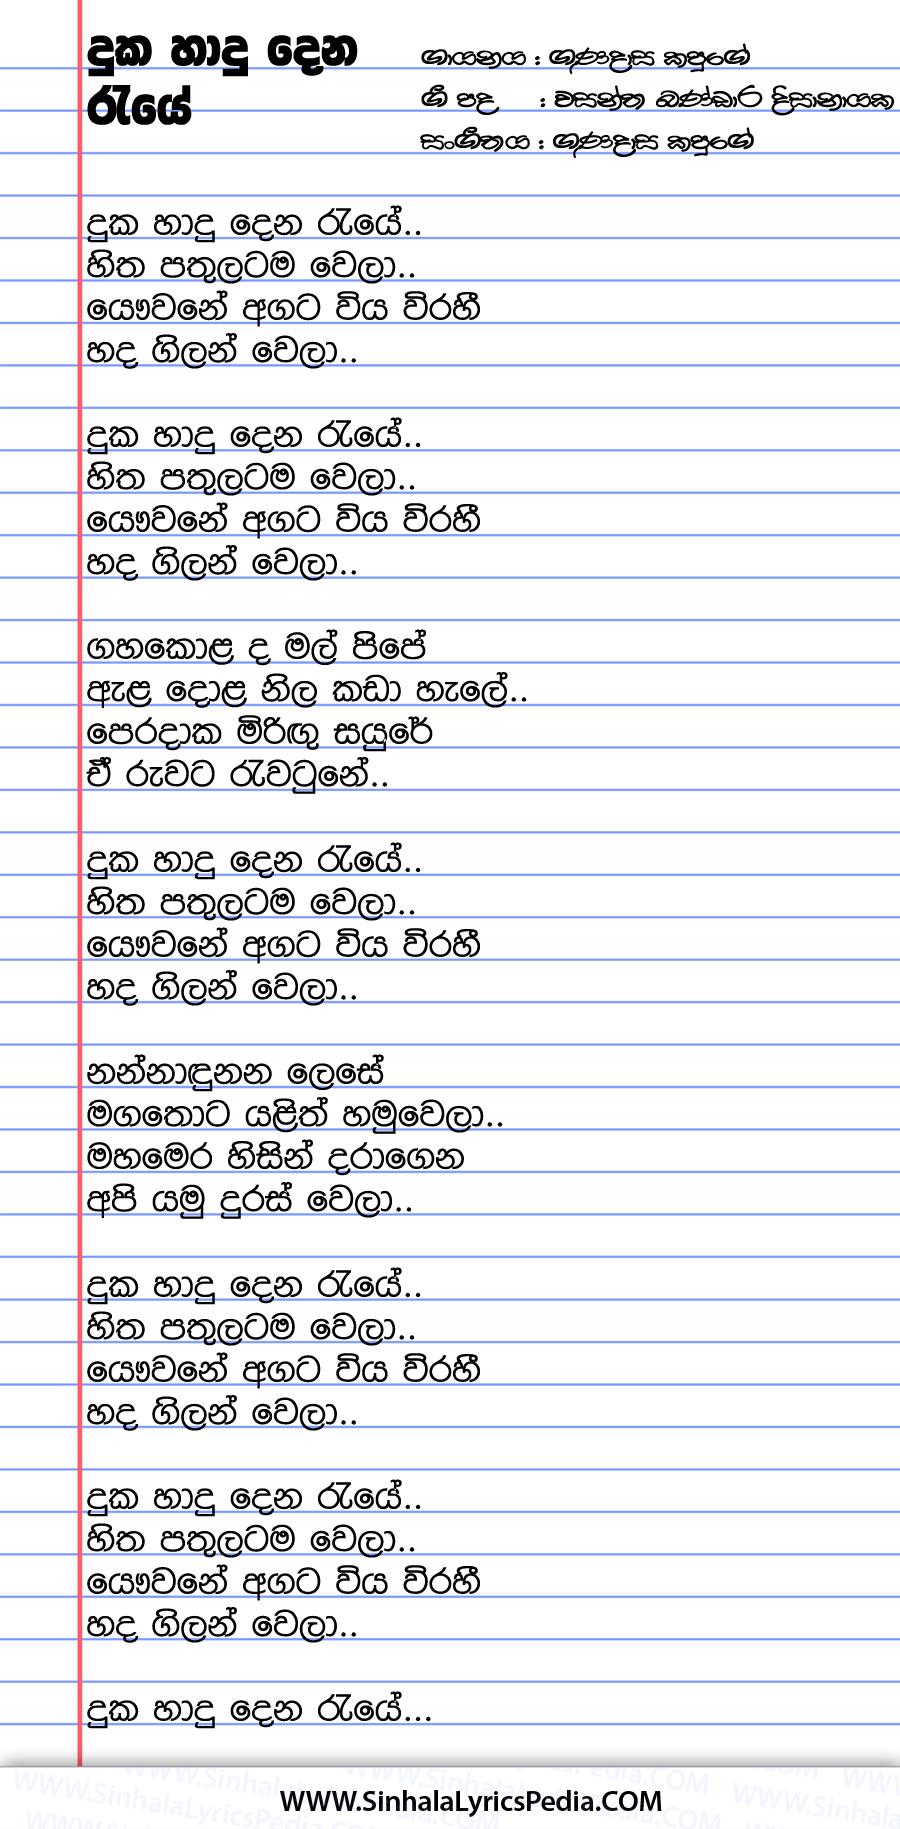 Duka Hadu Dena Raye Song Lyrics